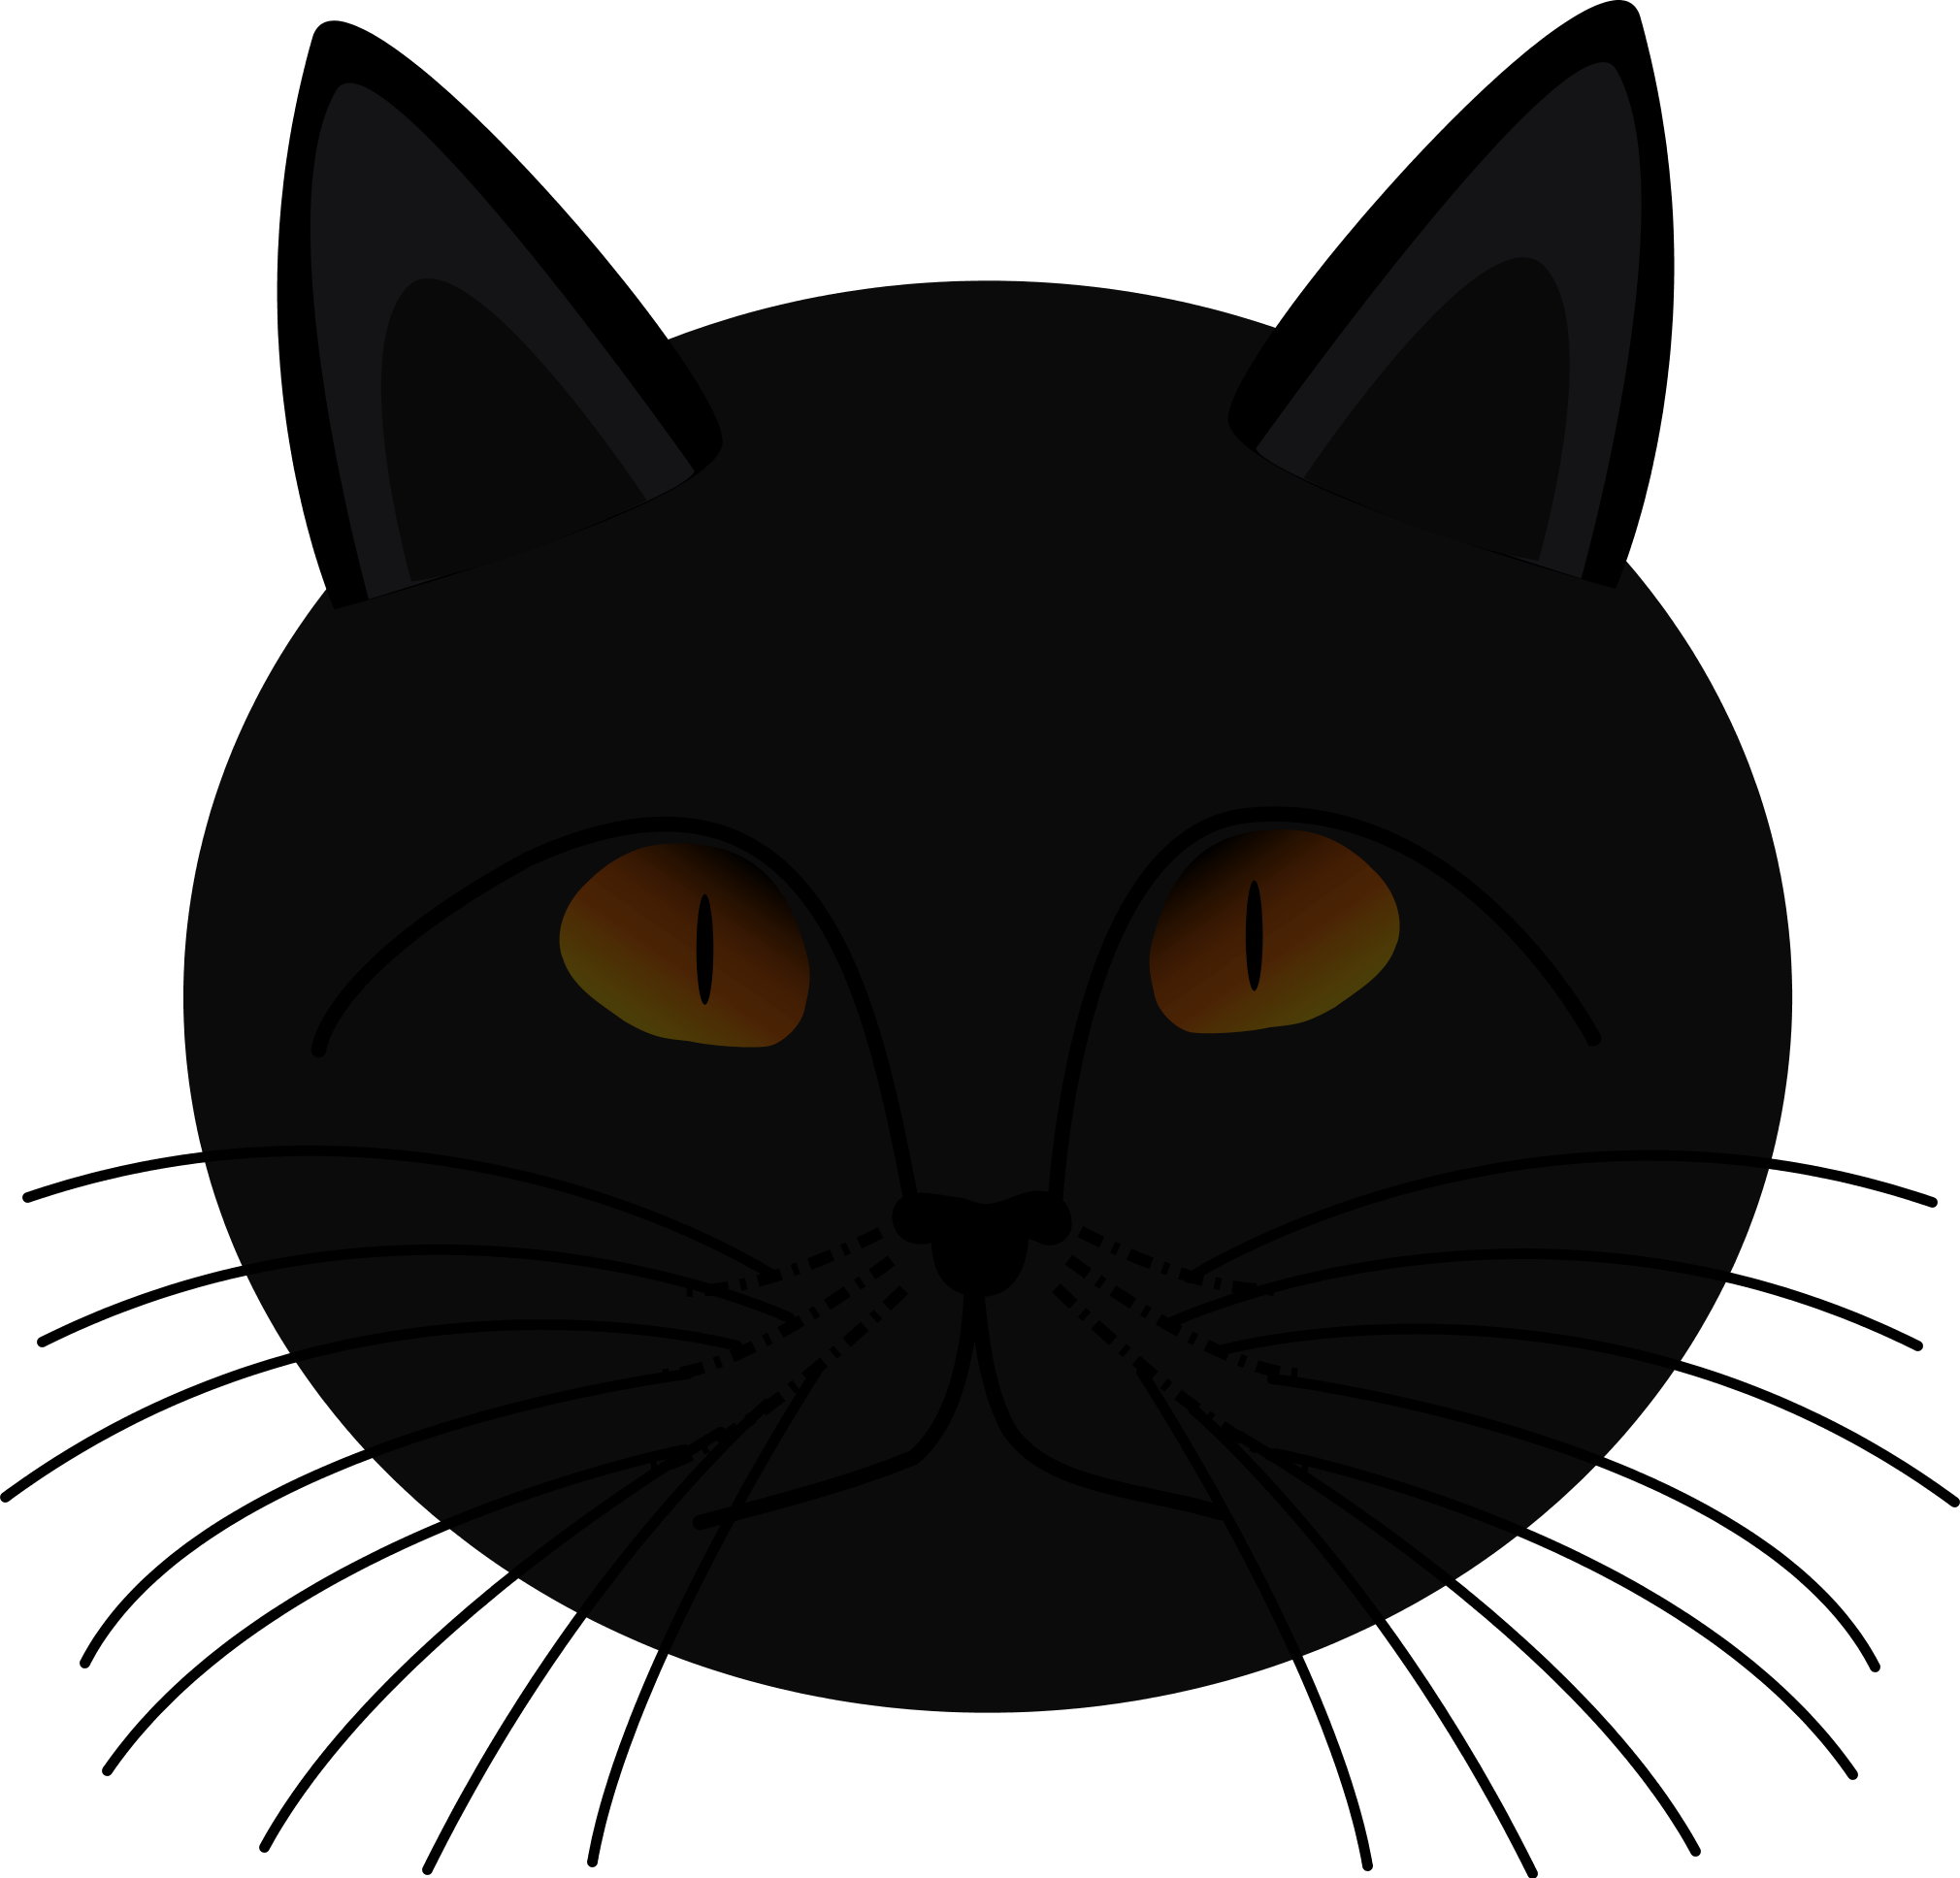 2020x1936 Halloween Cat Clipart